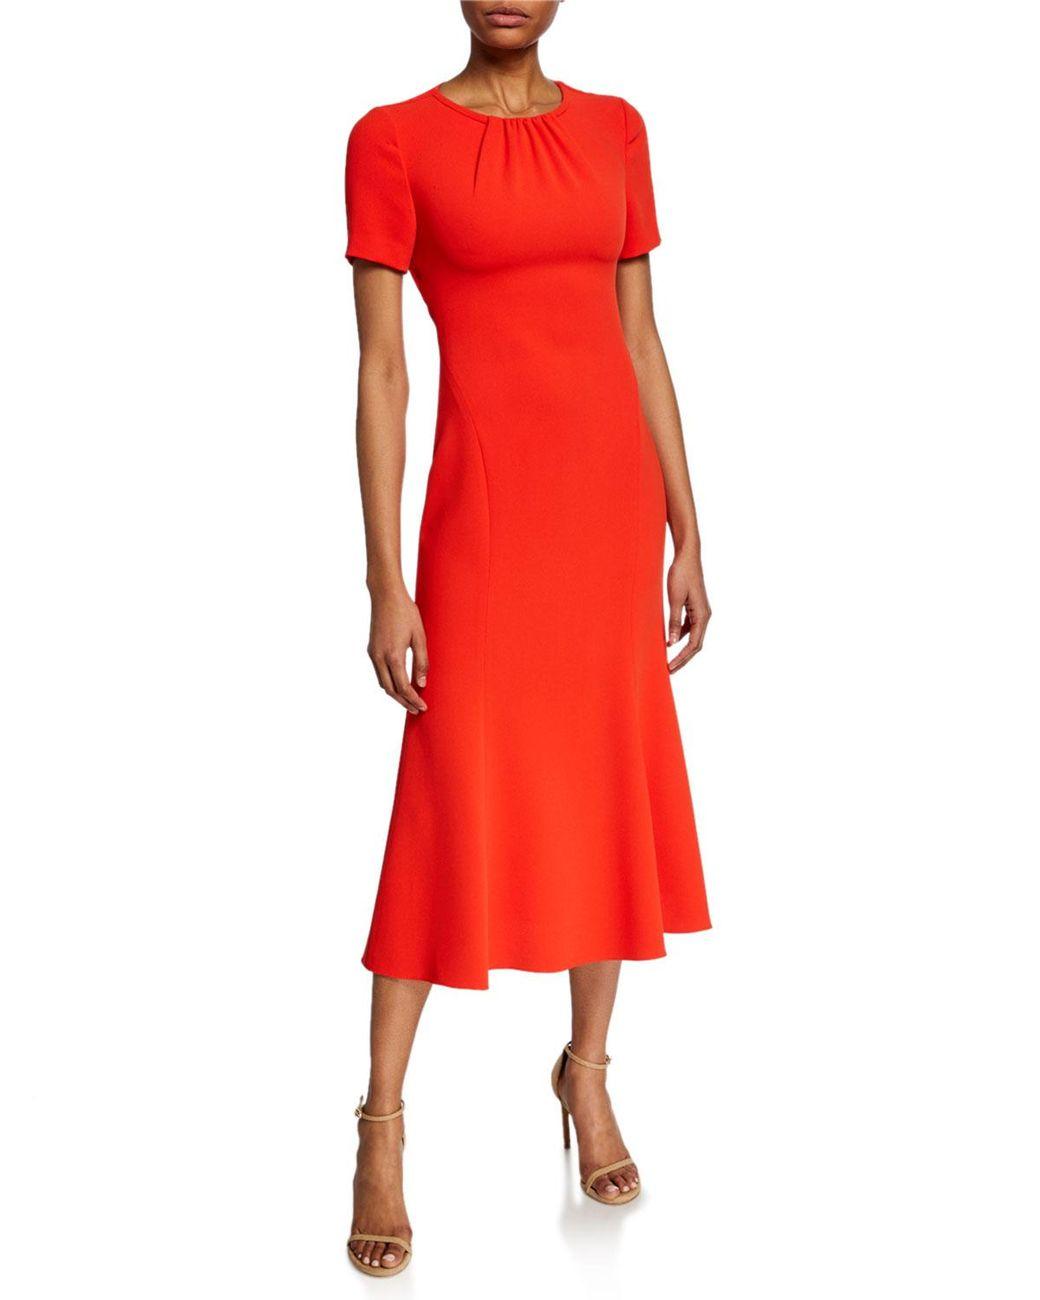 ecc3ad9b9d Diane von Furstenberg Rose Short-sleeve Midi Dress With Back Cutout in Red  - Save 40% - Lyst